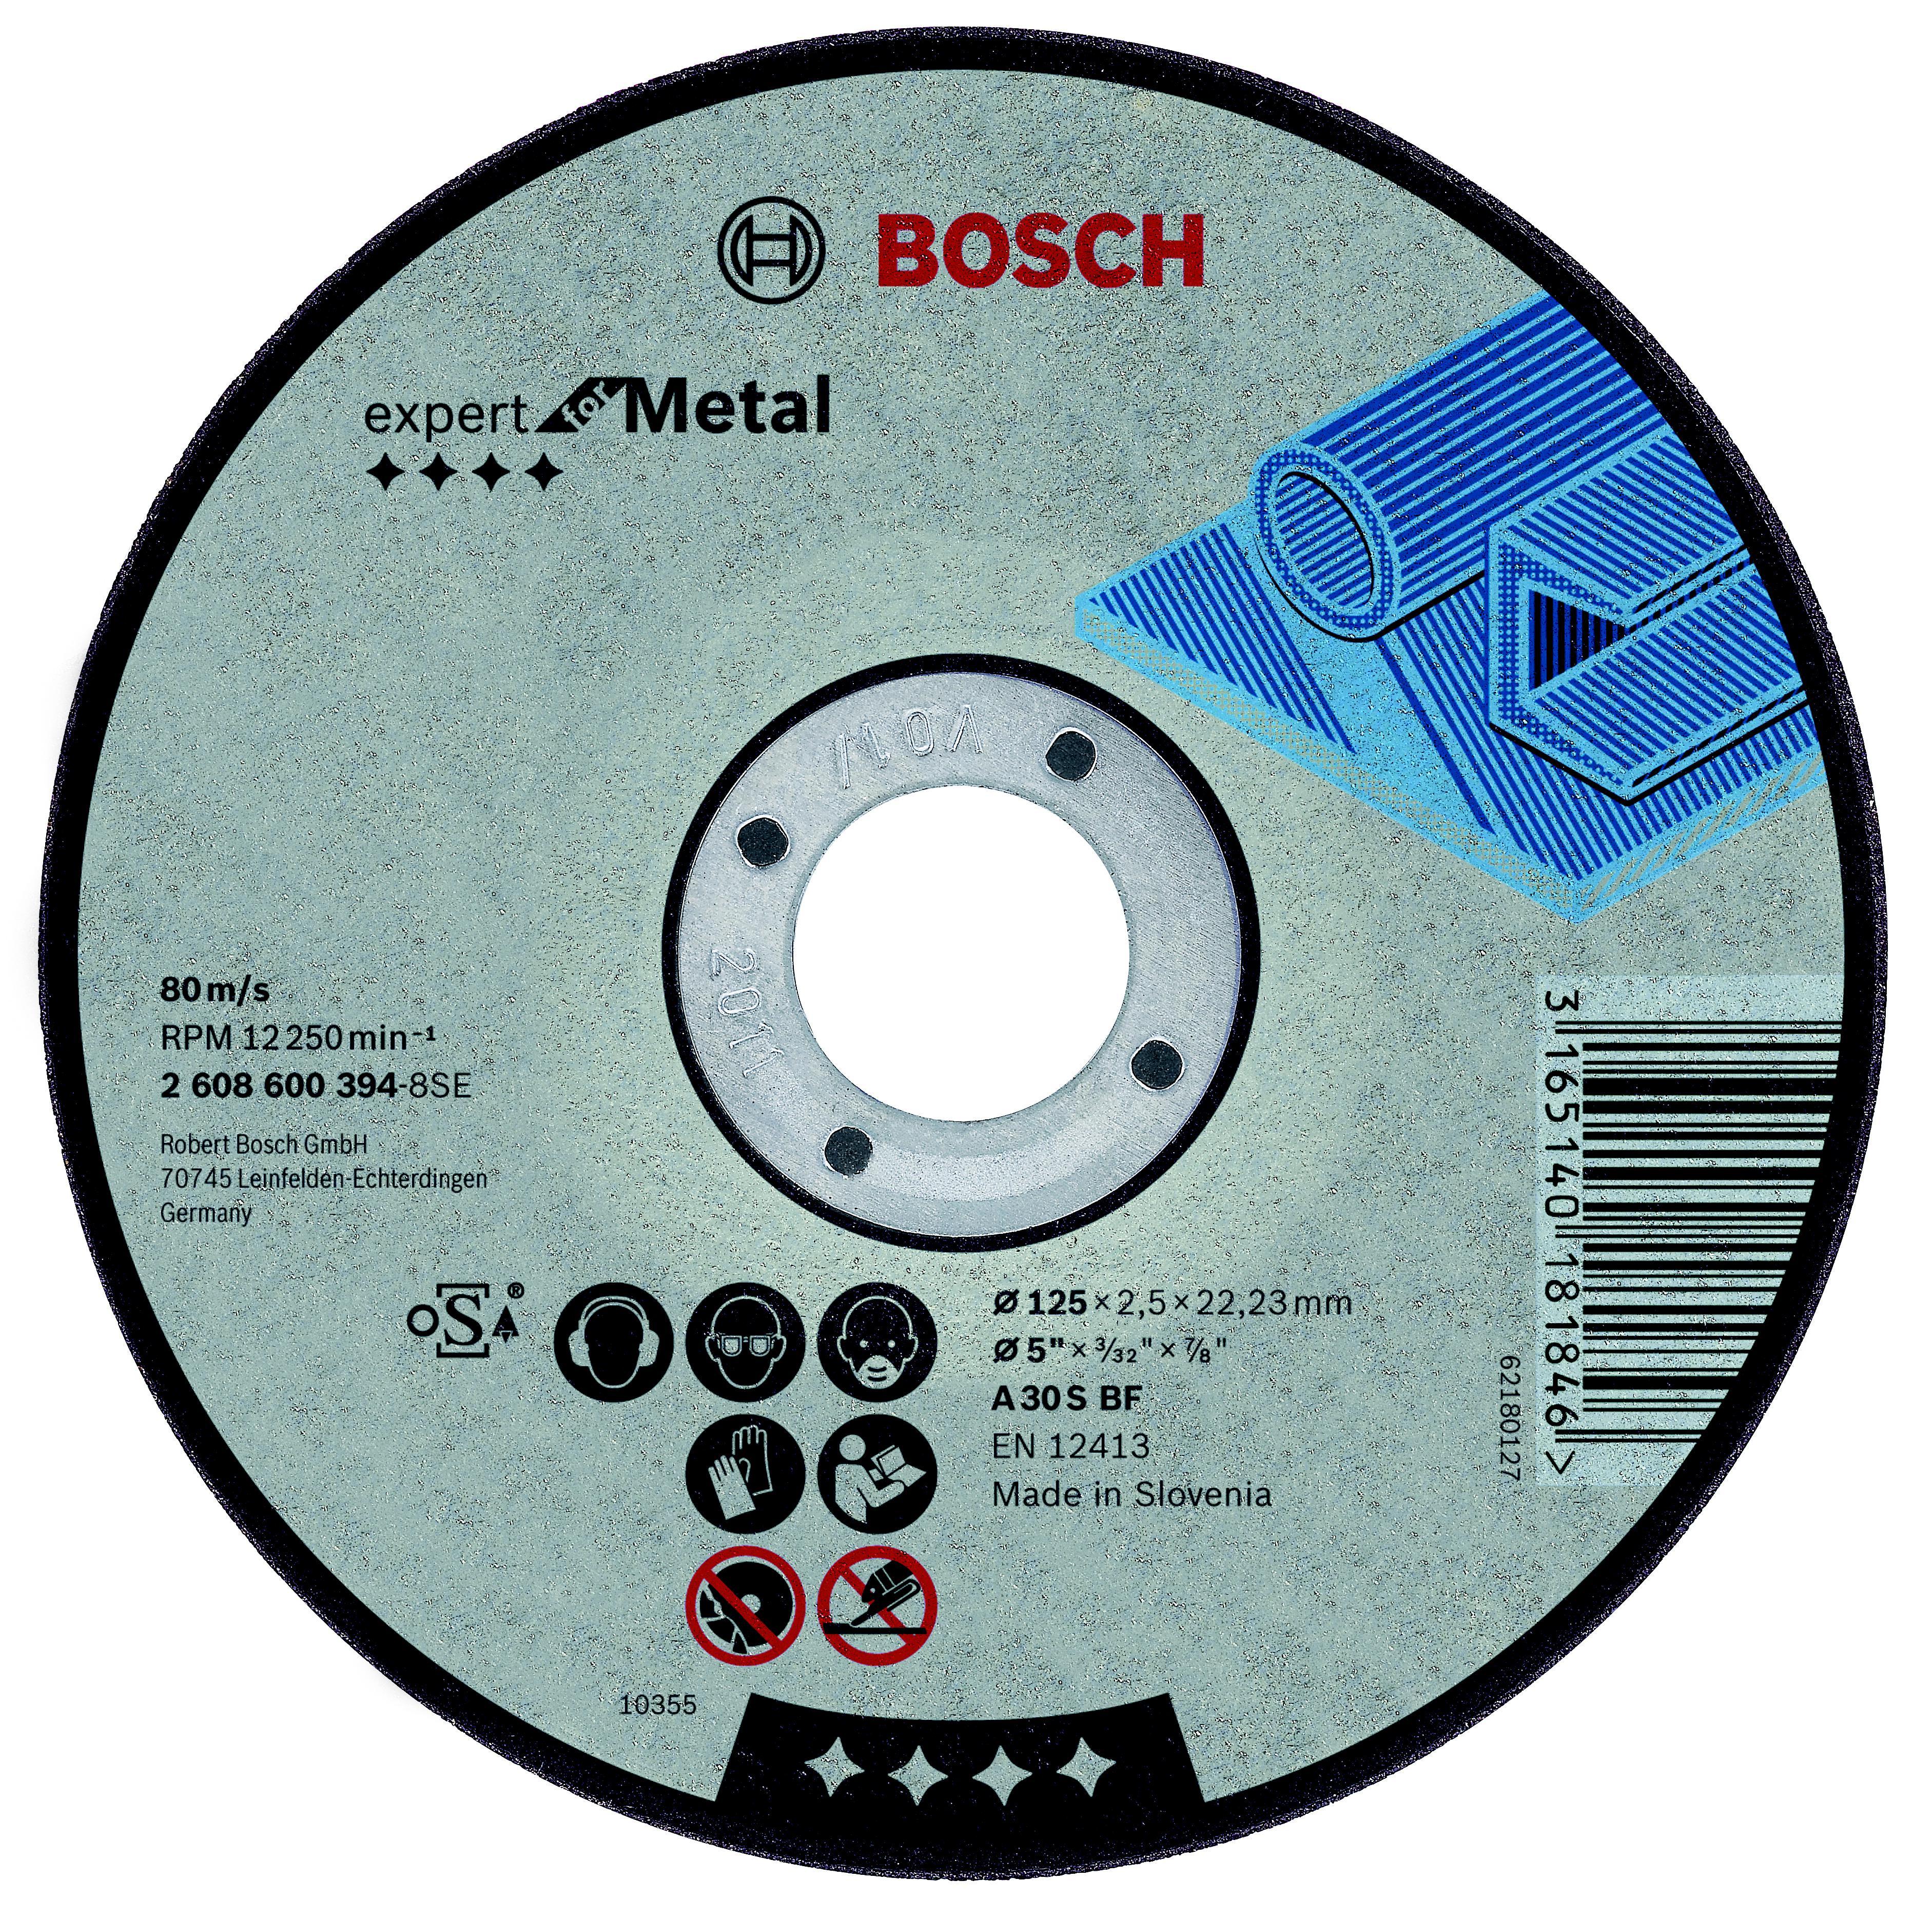 Фото 1/2 Expert for metal 115 Х 2,5 Х 22, Круг отрезной